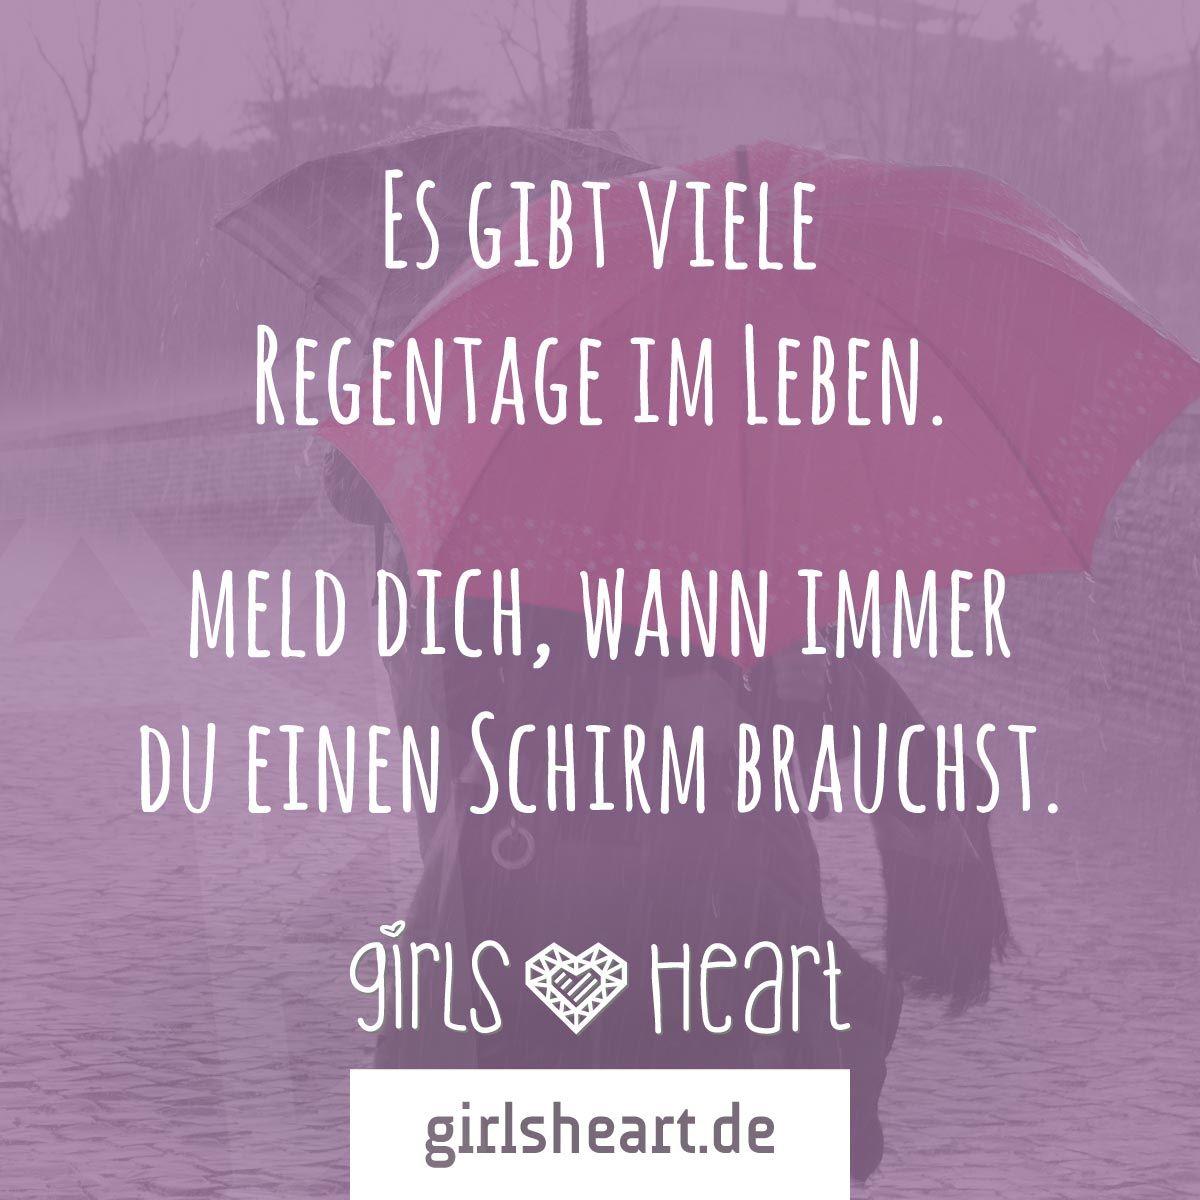 Mehr Sprüche auf: .girlsheart.de #regen #regenschirm #leben